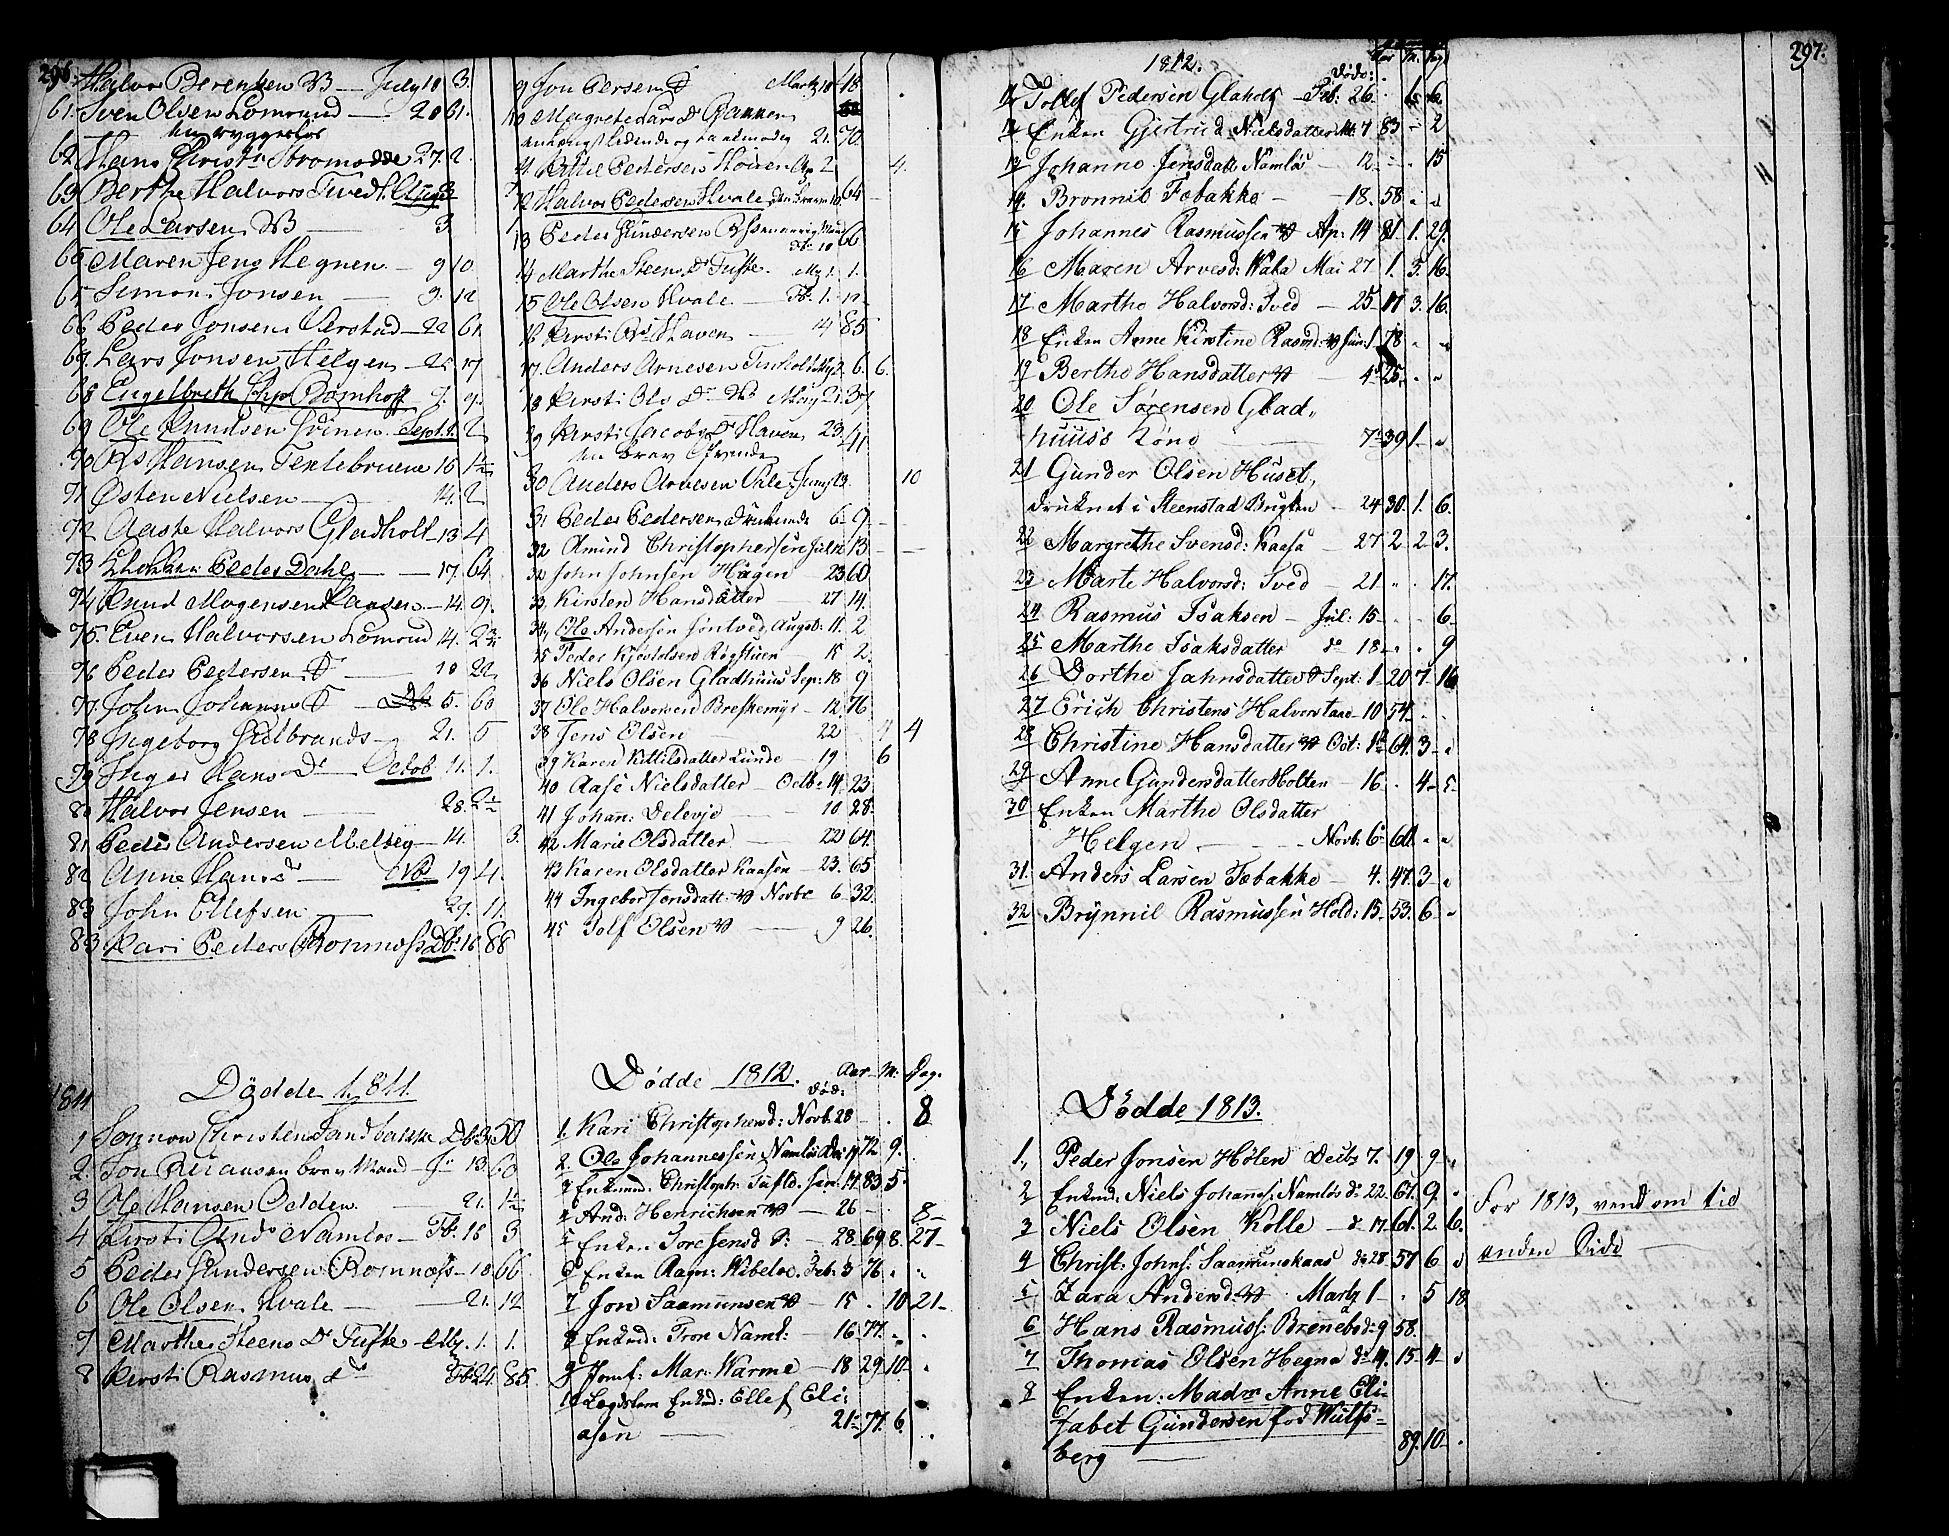 SAKO, Holla kirkebøker, F/Fa/L0002: Ministerialbok nr. 2, 1779-1814, s. 296-297